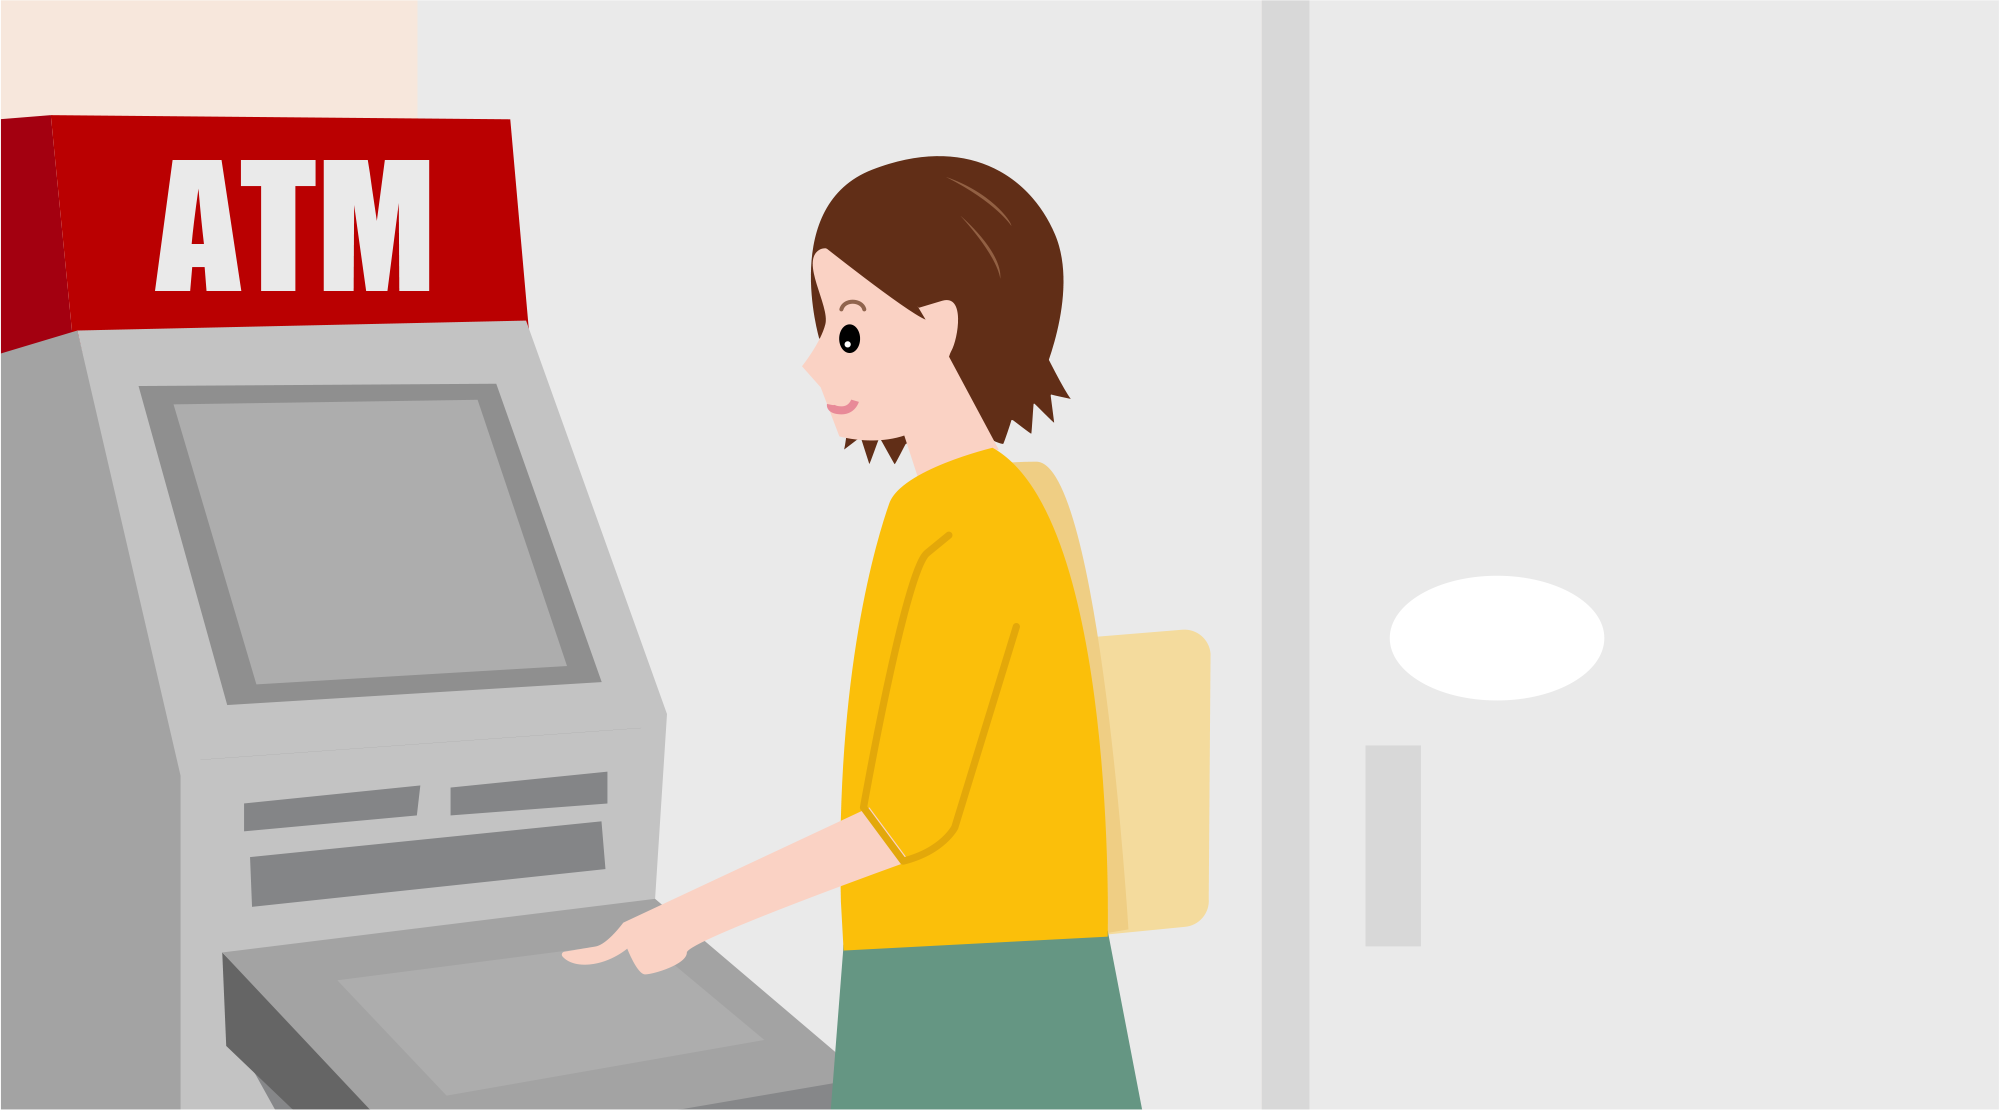 ATMを使う女性のイラスト